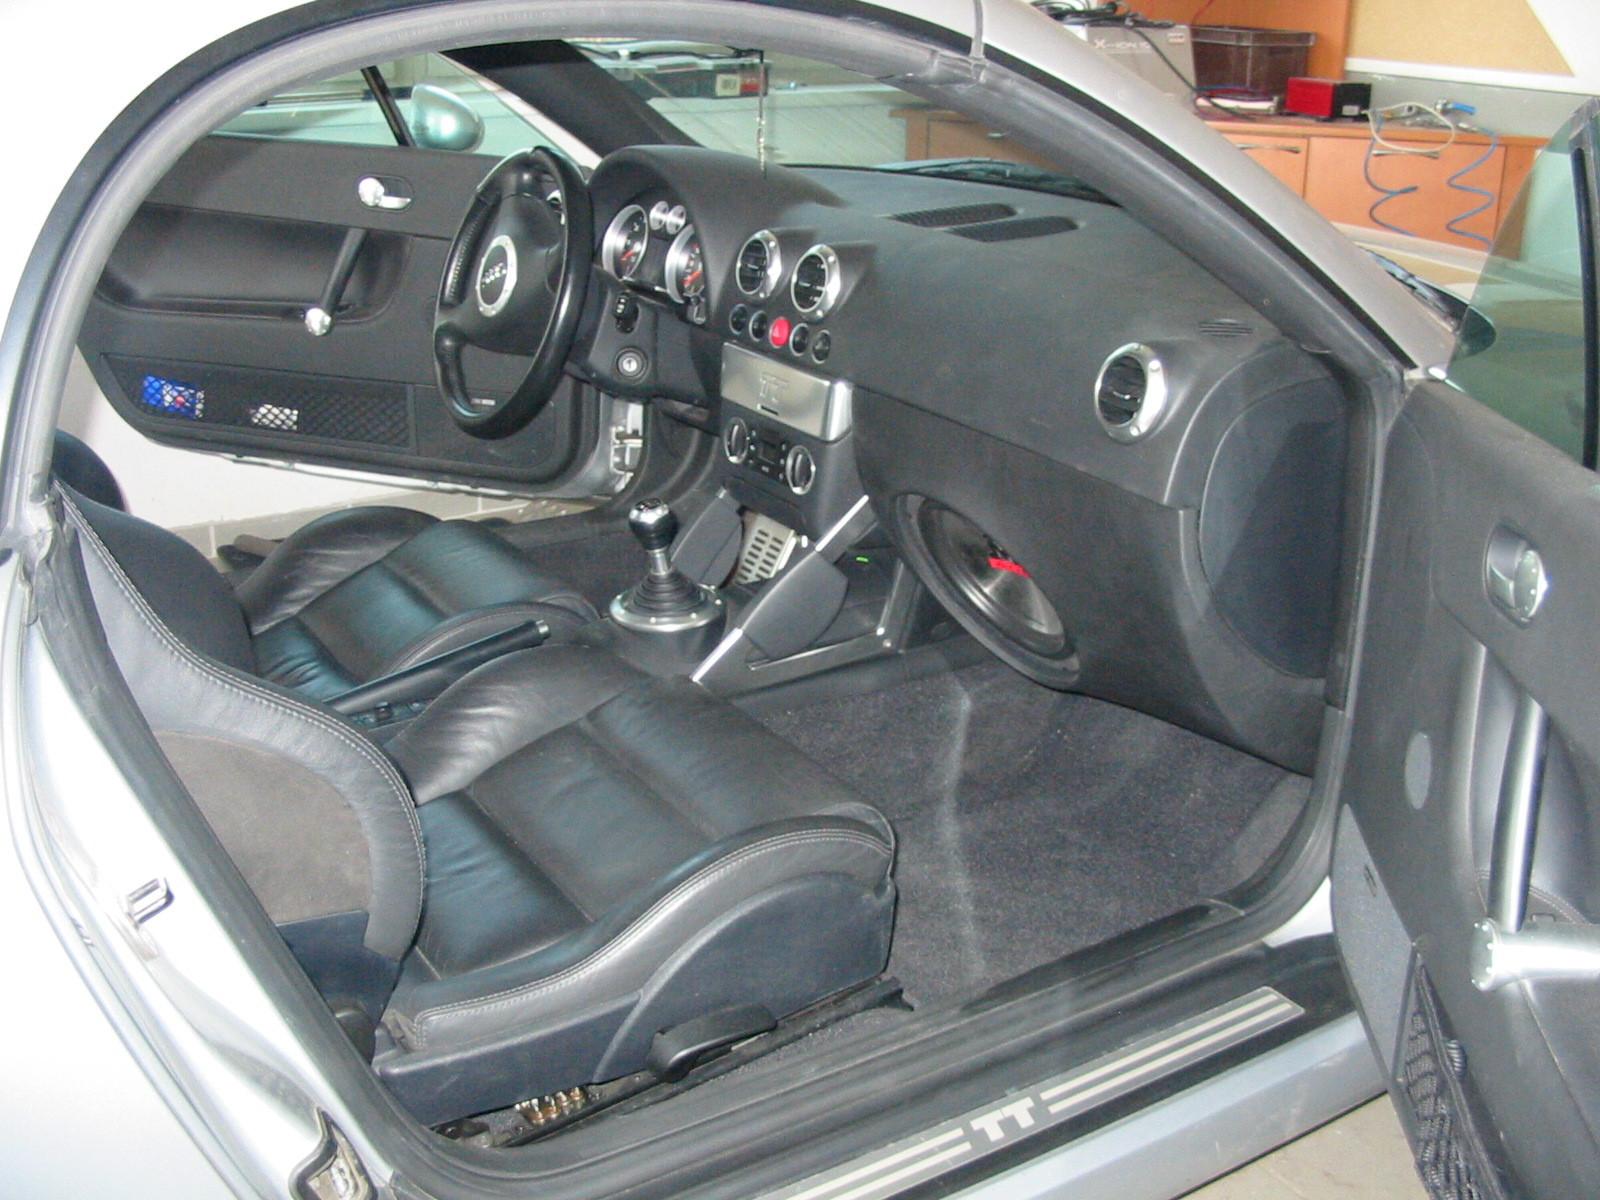 Audi TT (8N) - Frontsubwoofer statt Handschuhfach